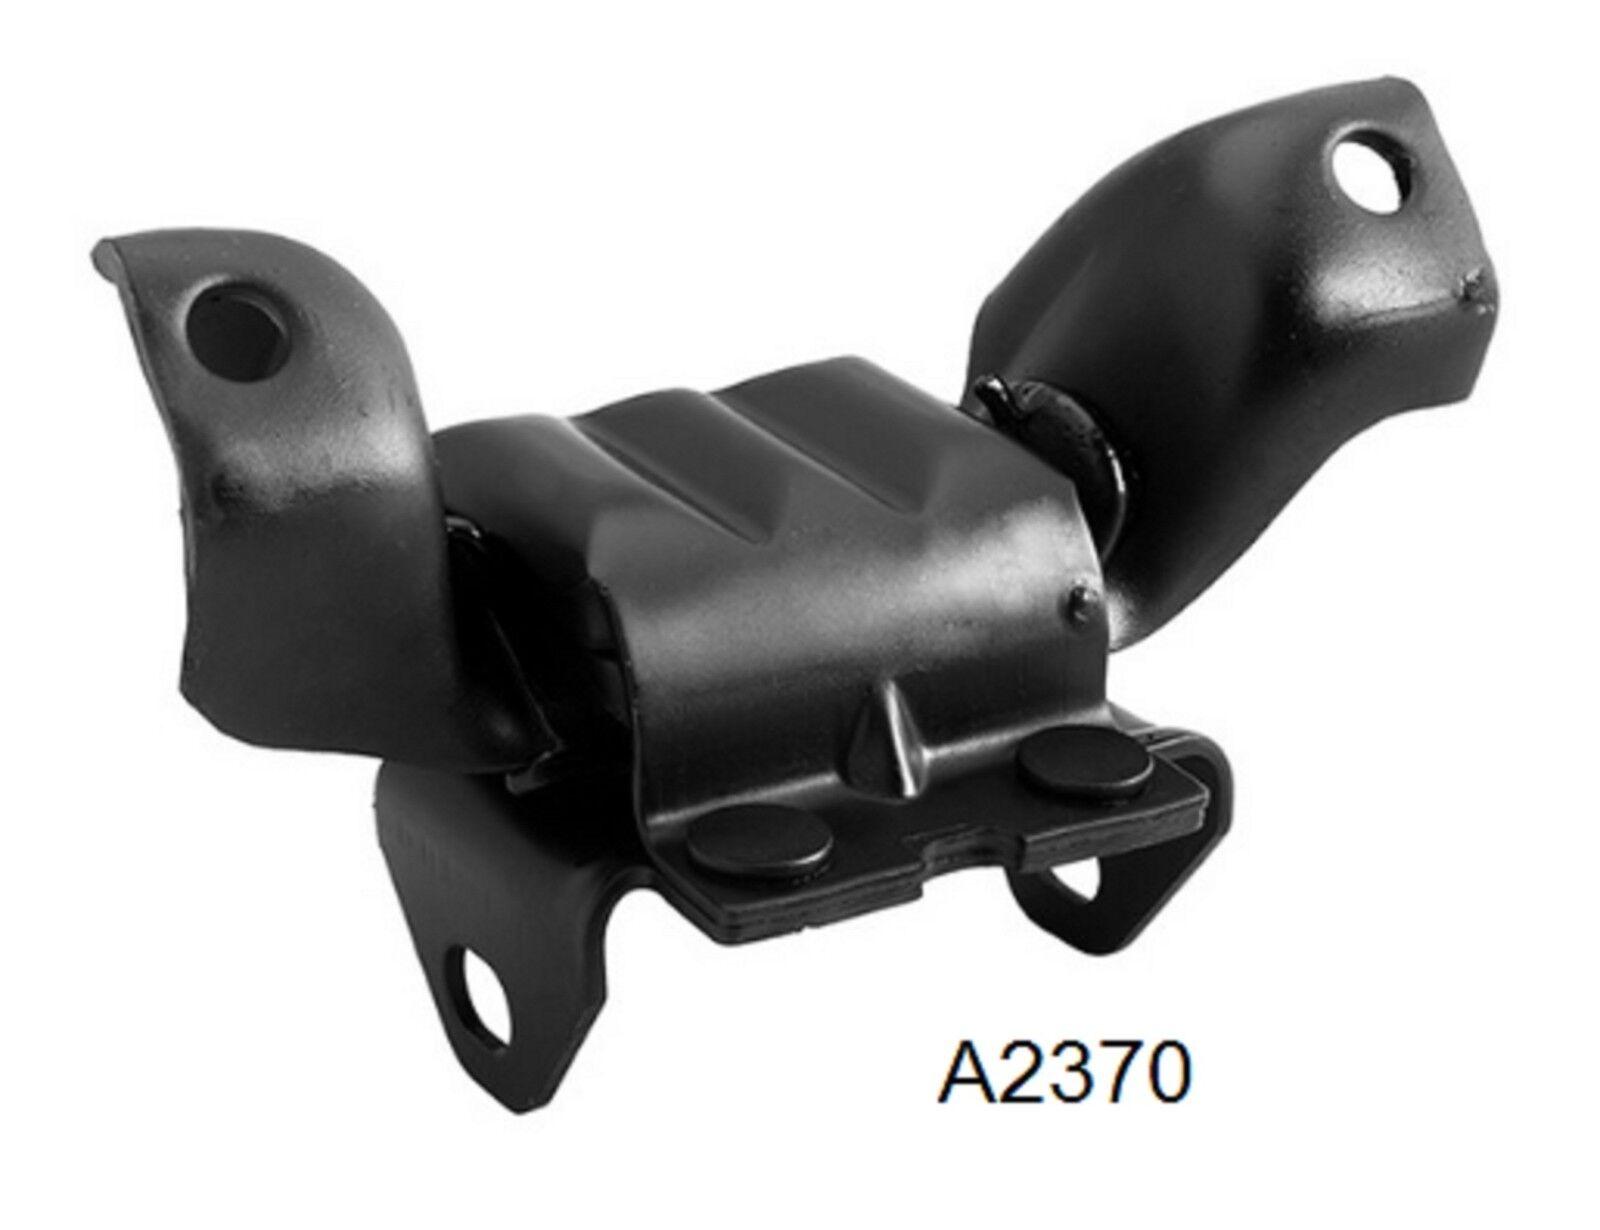 2PCS FRONT LEFT /& RIGHT MOTOR MOUNT FOR 72-74 MERCURY MONTEGO 5.8L CLEVELAND ENG